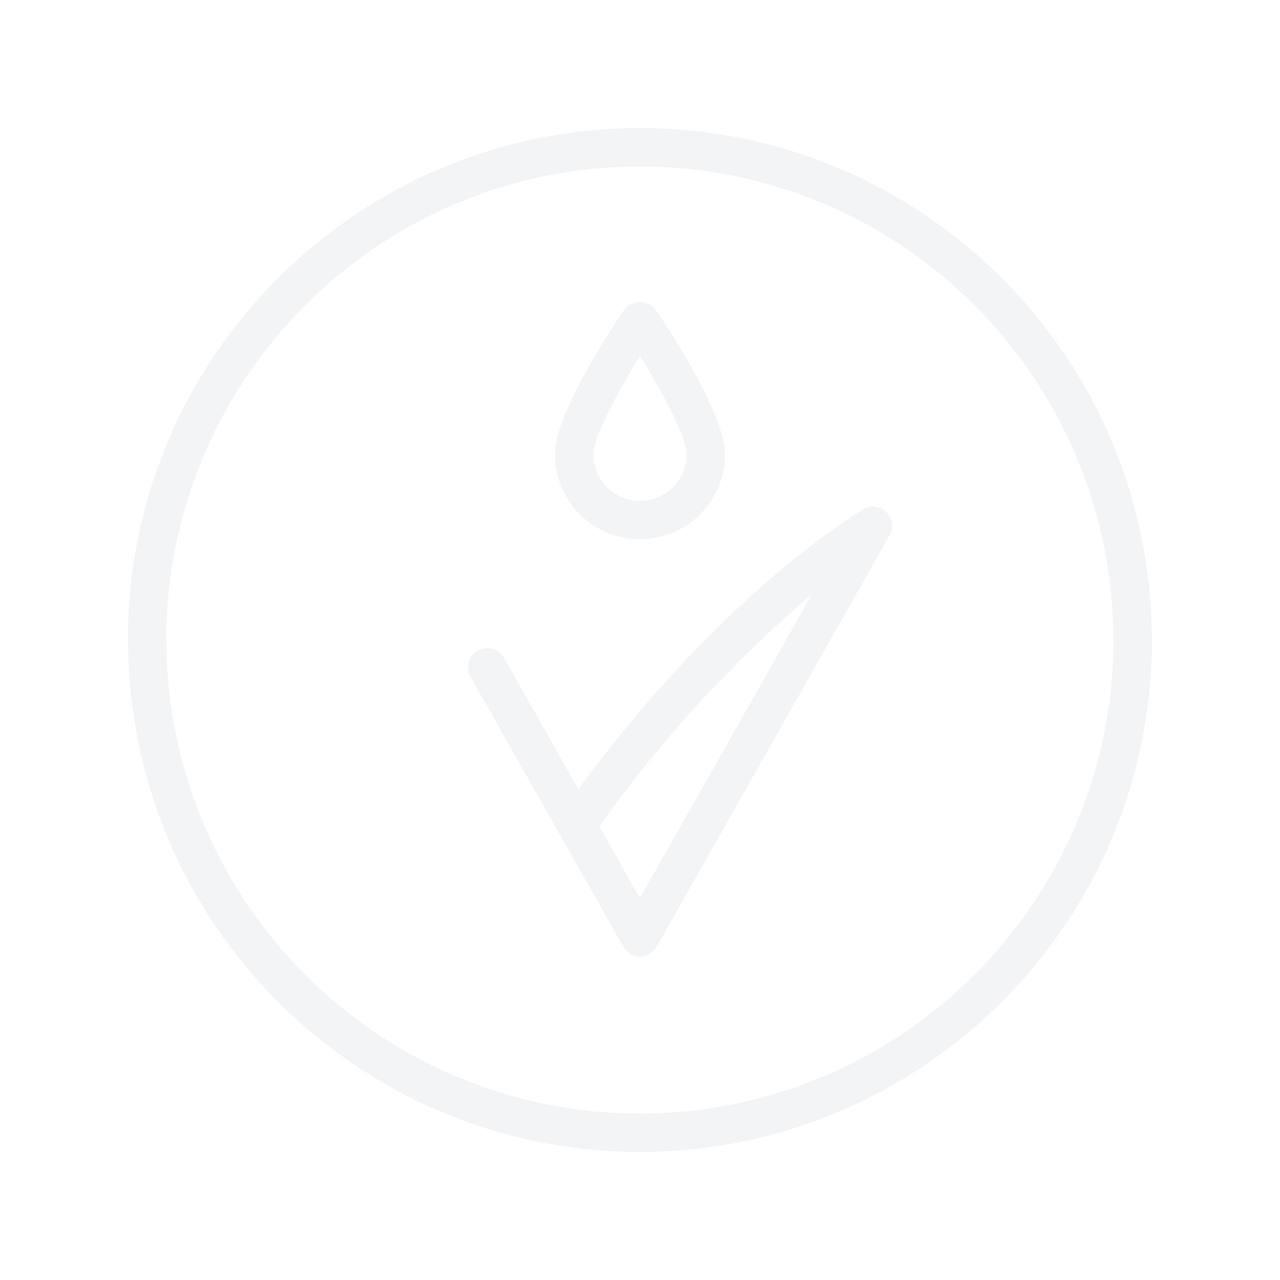 PACIFIC SHAVING Pre-Shave Exfoliating Wash 89ml